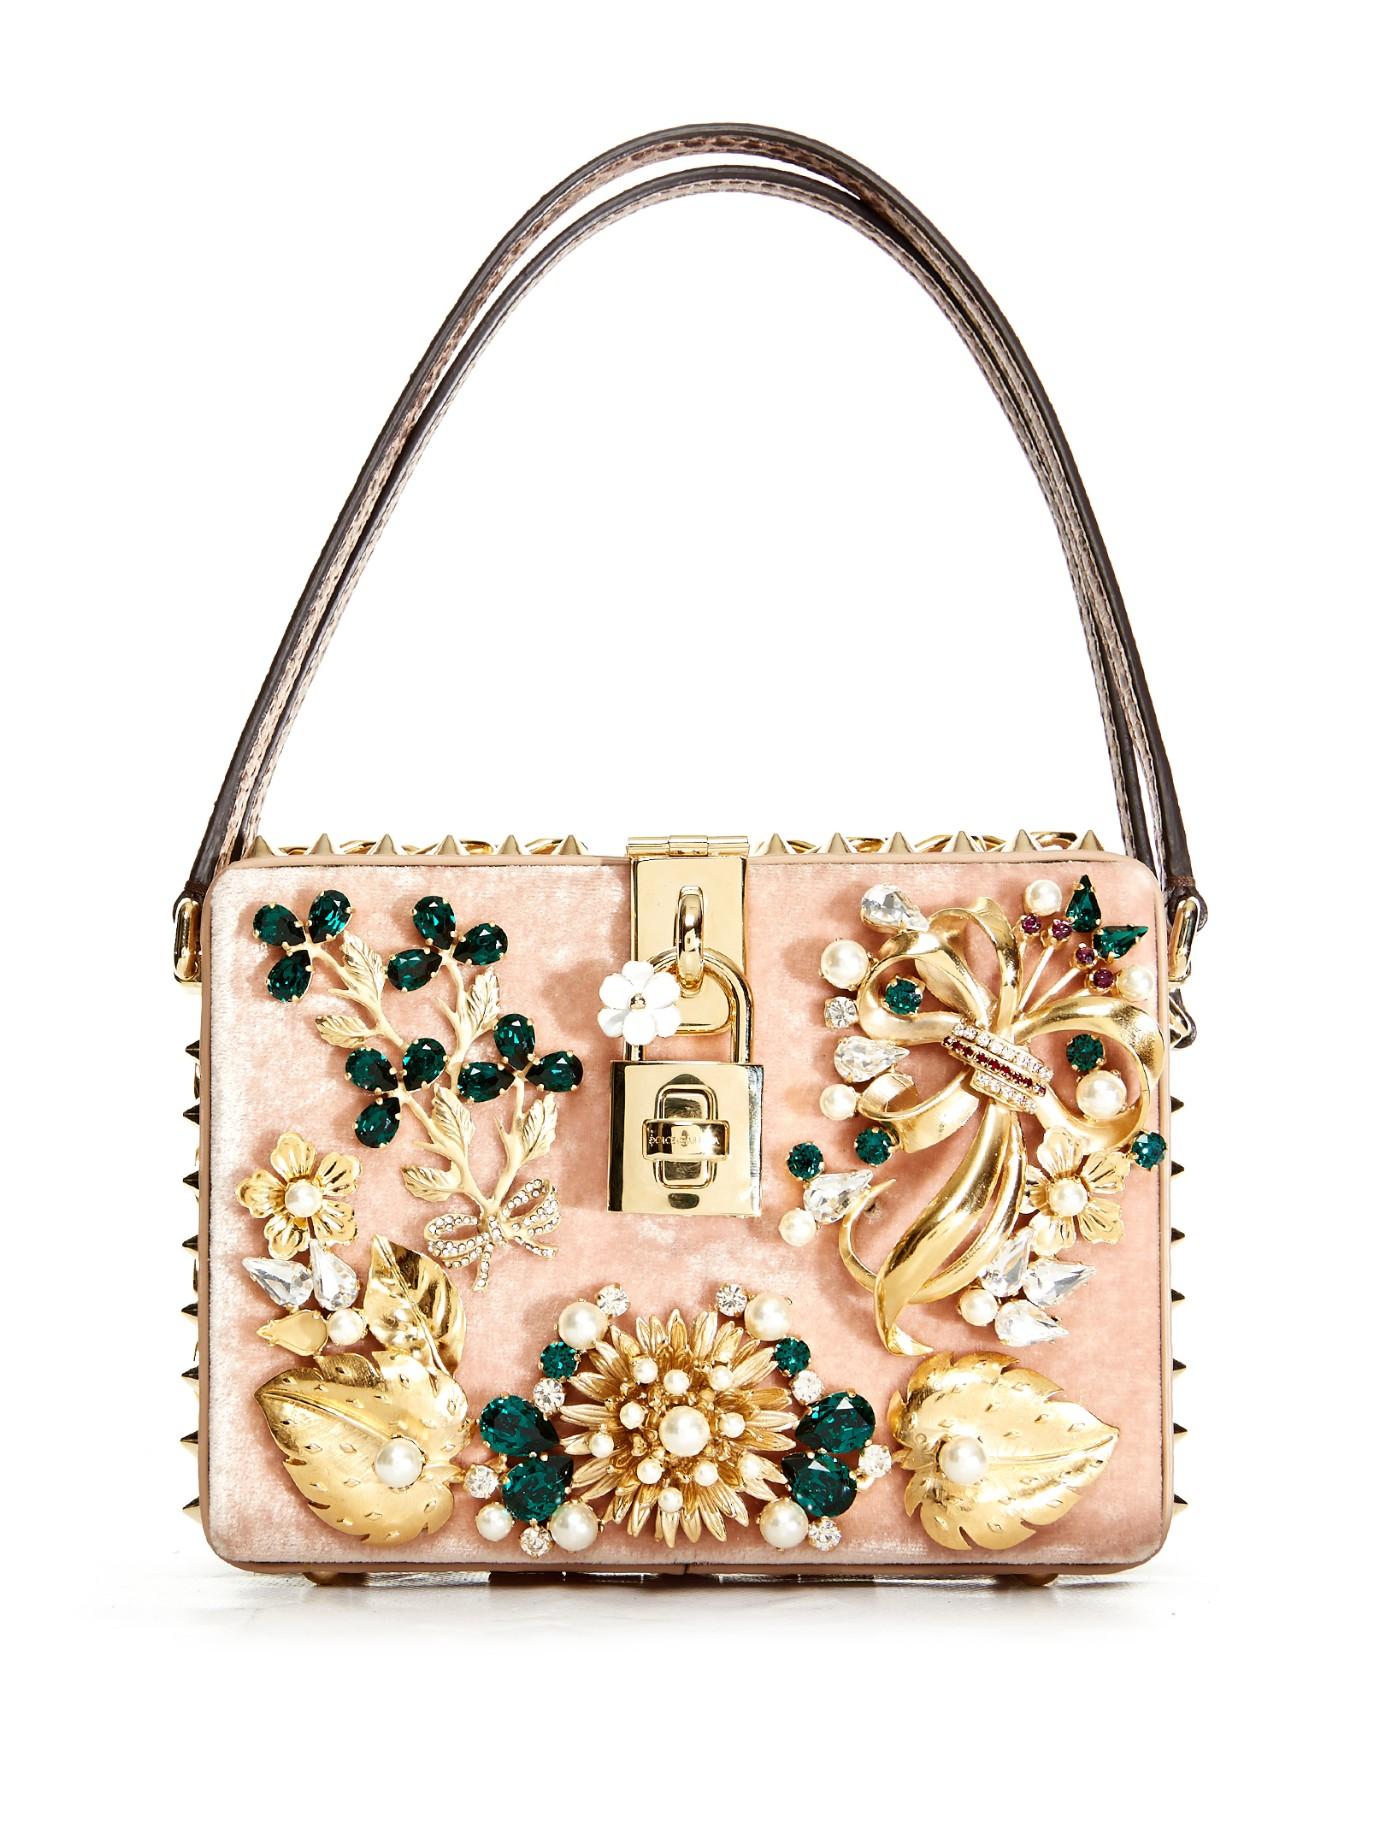 Dolce & Gabbana embellished backpack Wholesale Price oC7SiJhvUe